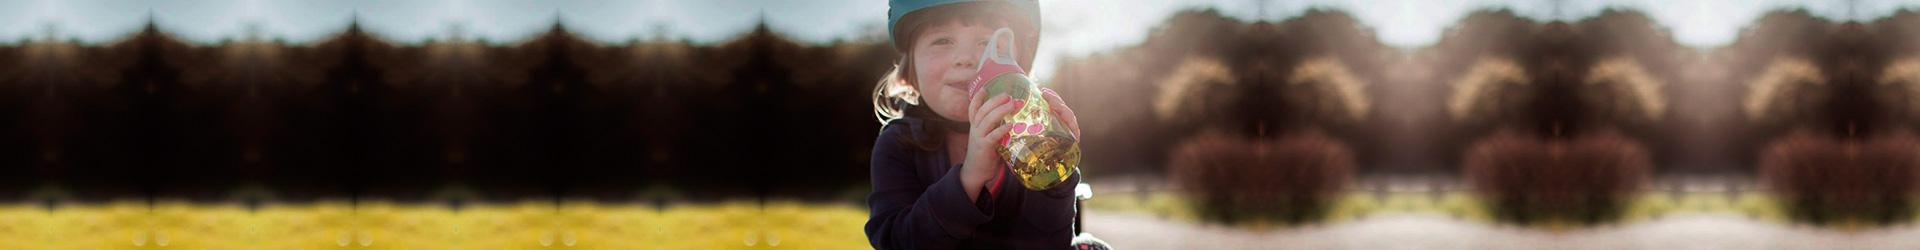 botella de agu para niños